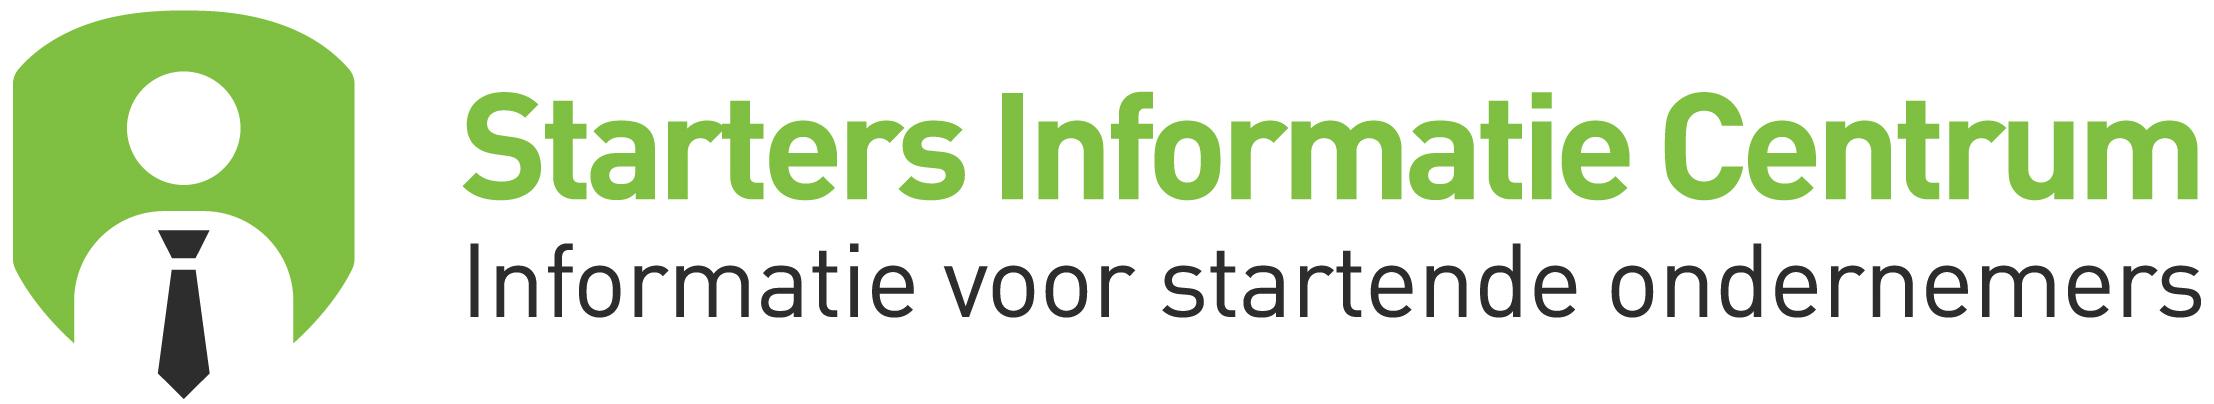 Startersinformatiecentrum.nl